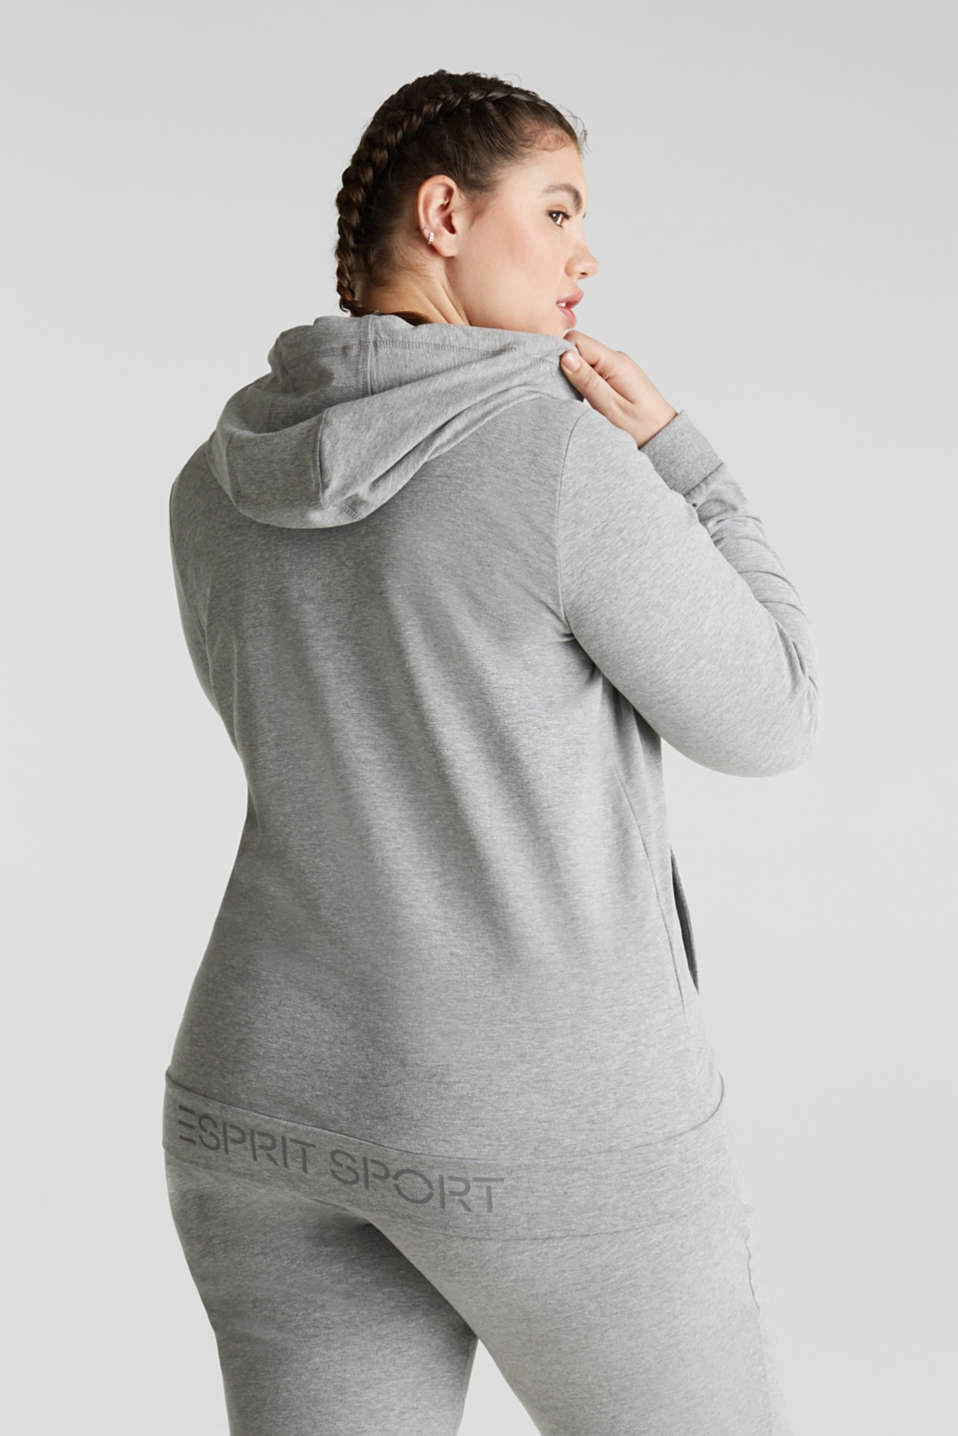 NEW YEAR. NEW ME. Hooded sweatshirt cardigan, MEDIUM GREY 2, detail image number 3